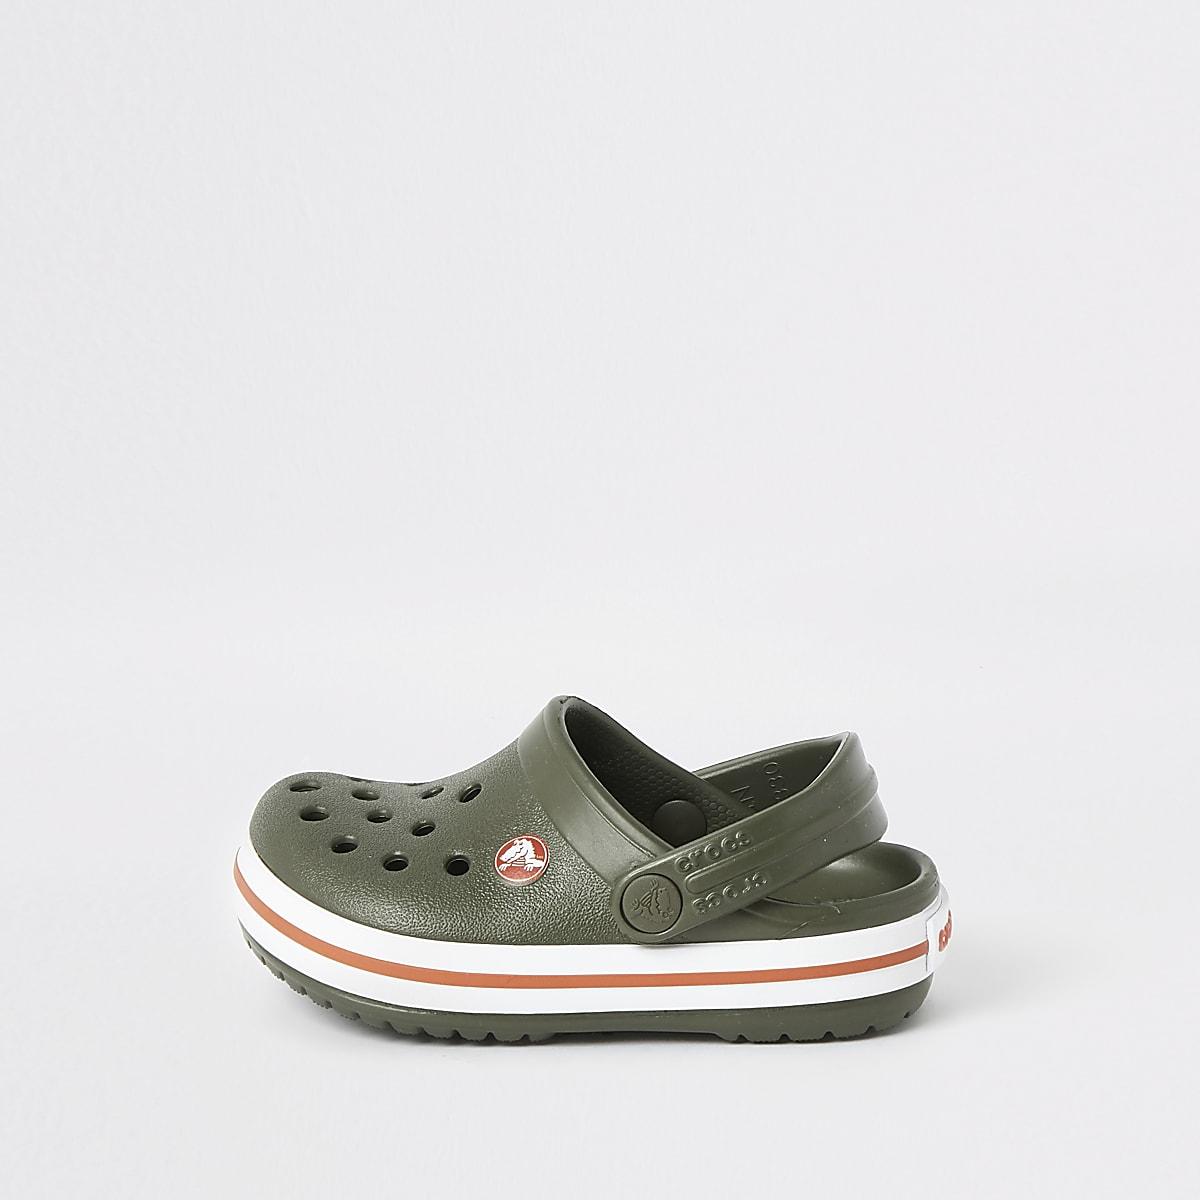 Mini boys Crocs khaki clogs